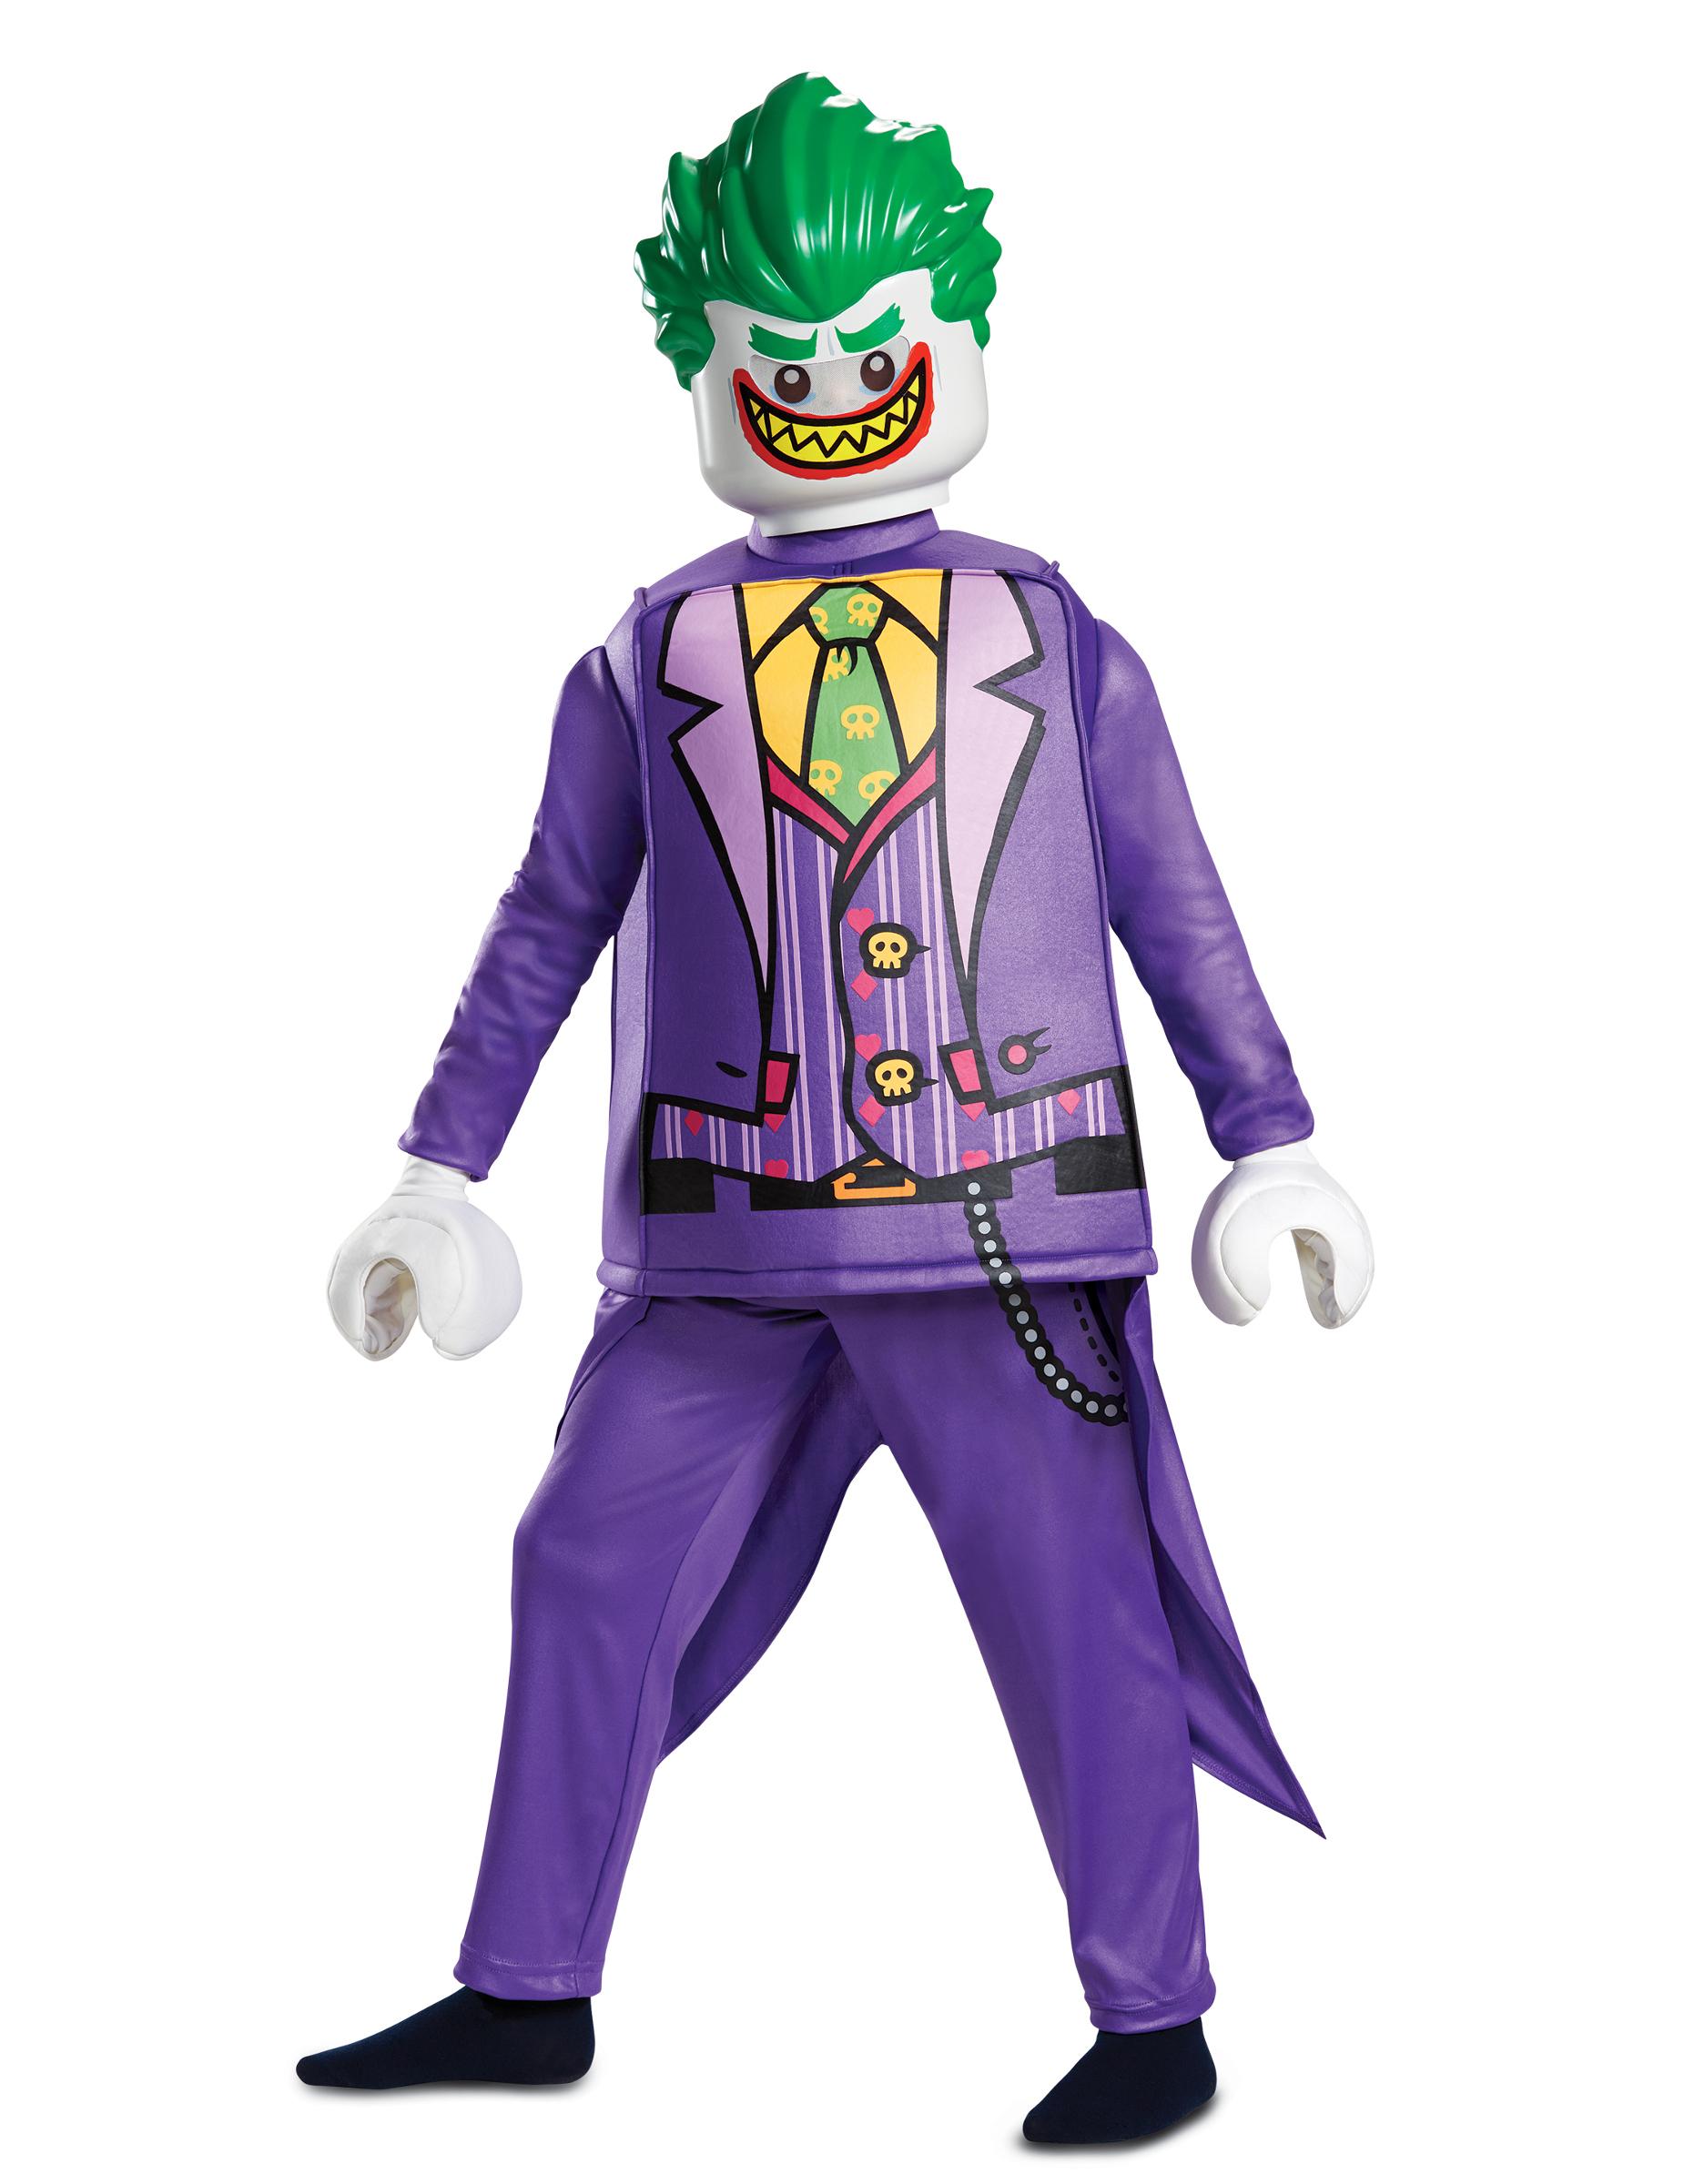 e316c8a11b9 Deluxe Joker LEGO® kostume til børn, køb Kostumer til børn på Vegaoo.dk